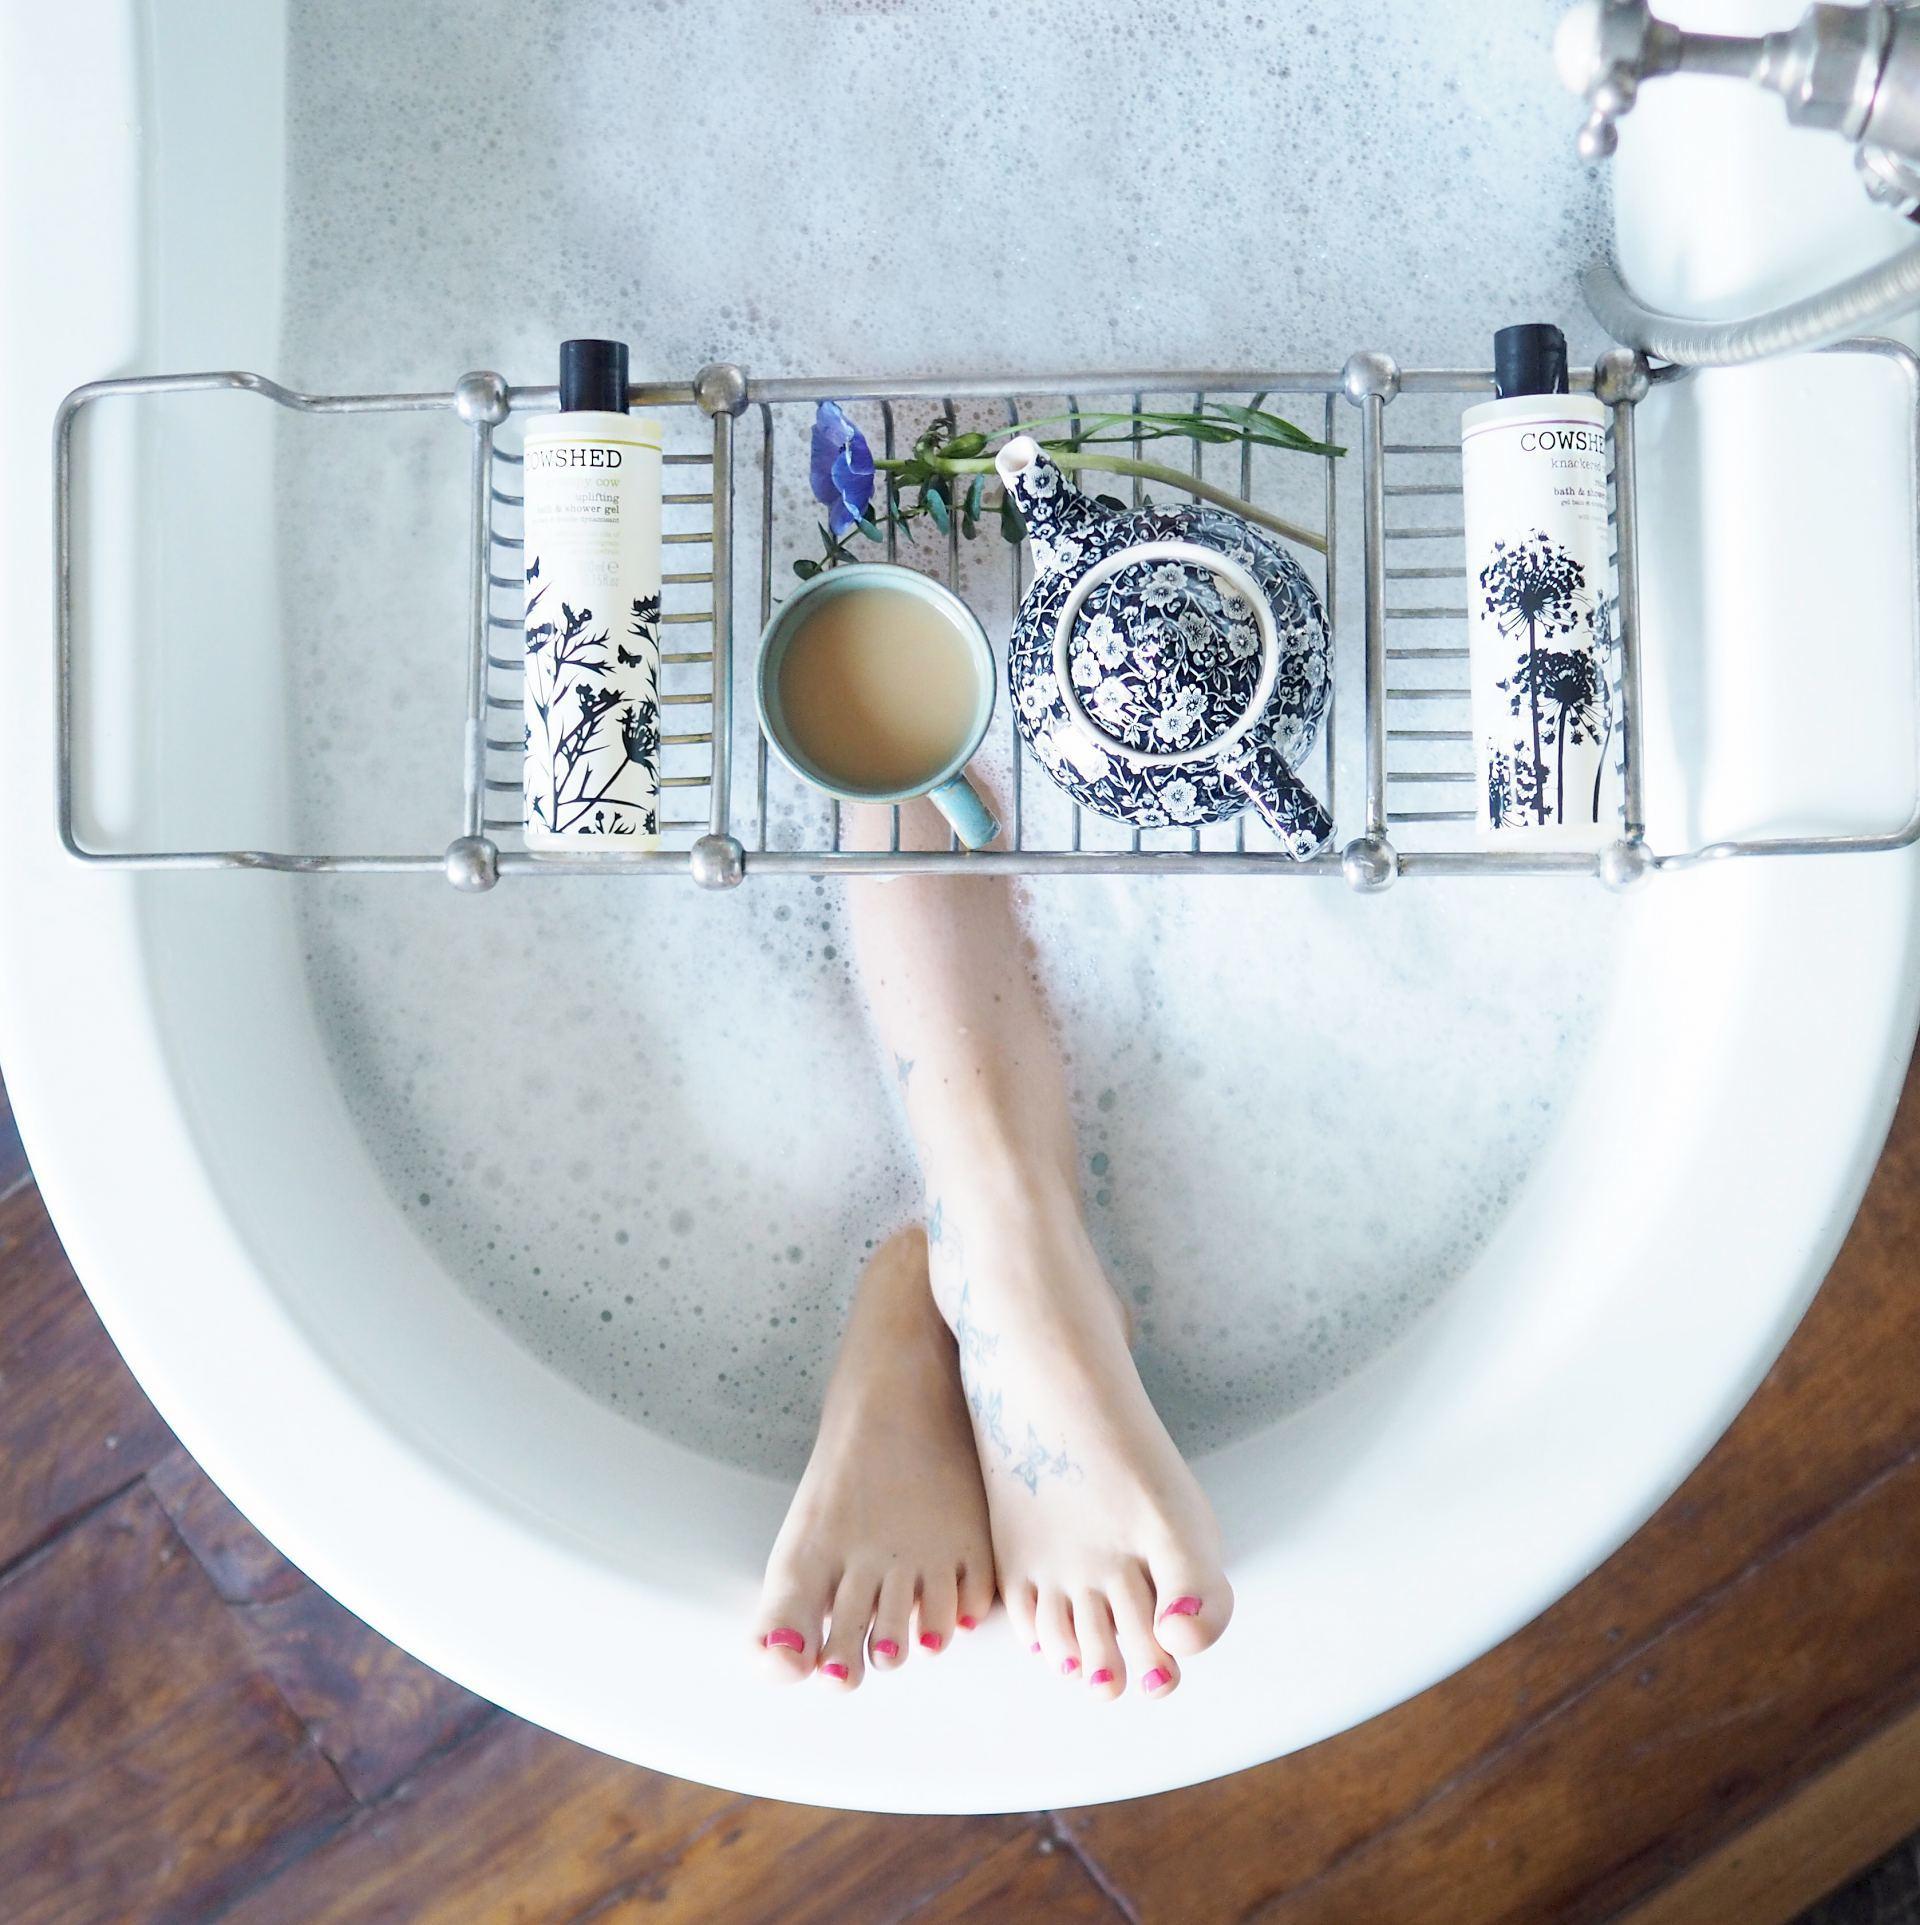 babbington house roll top bath